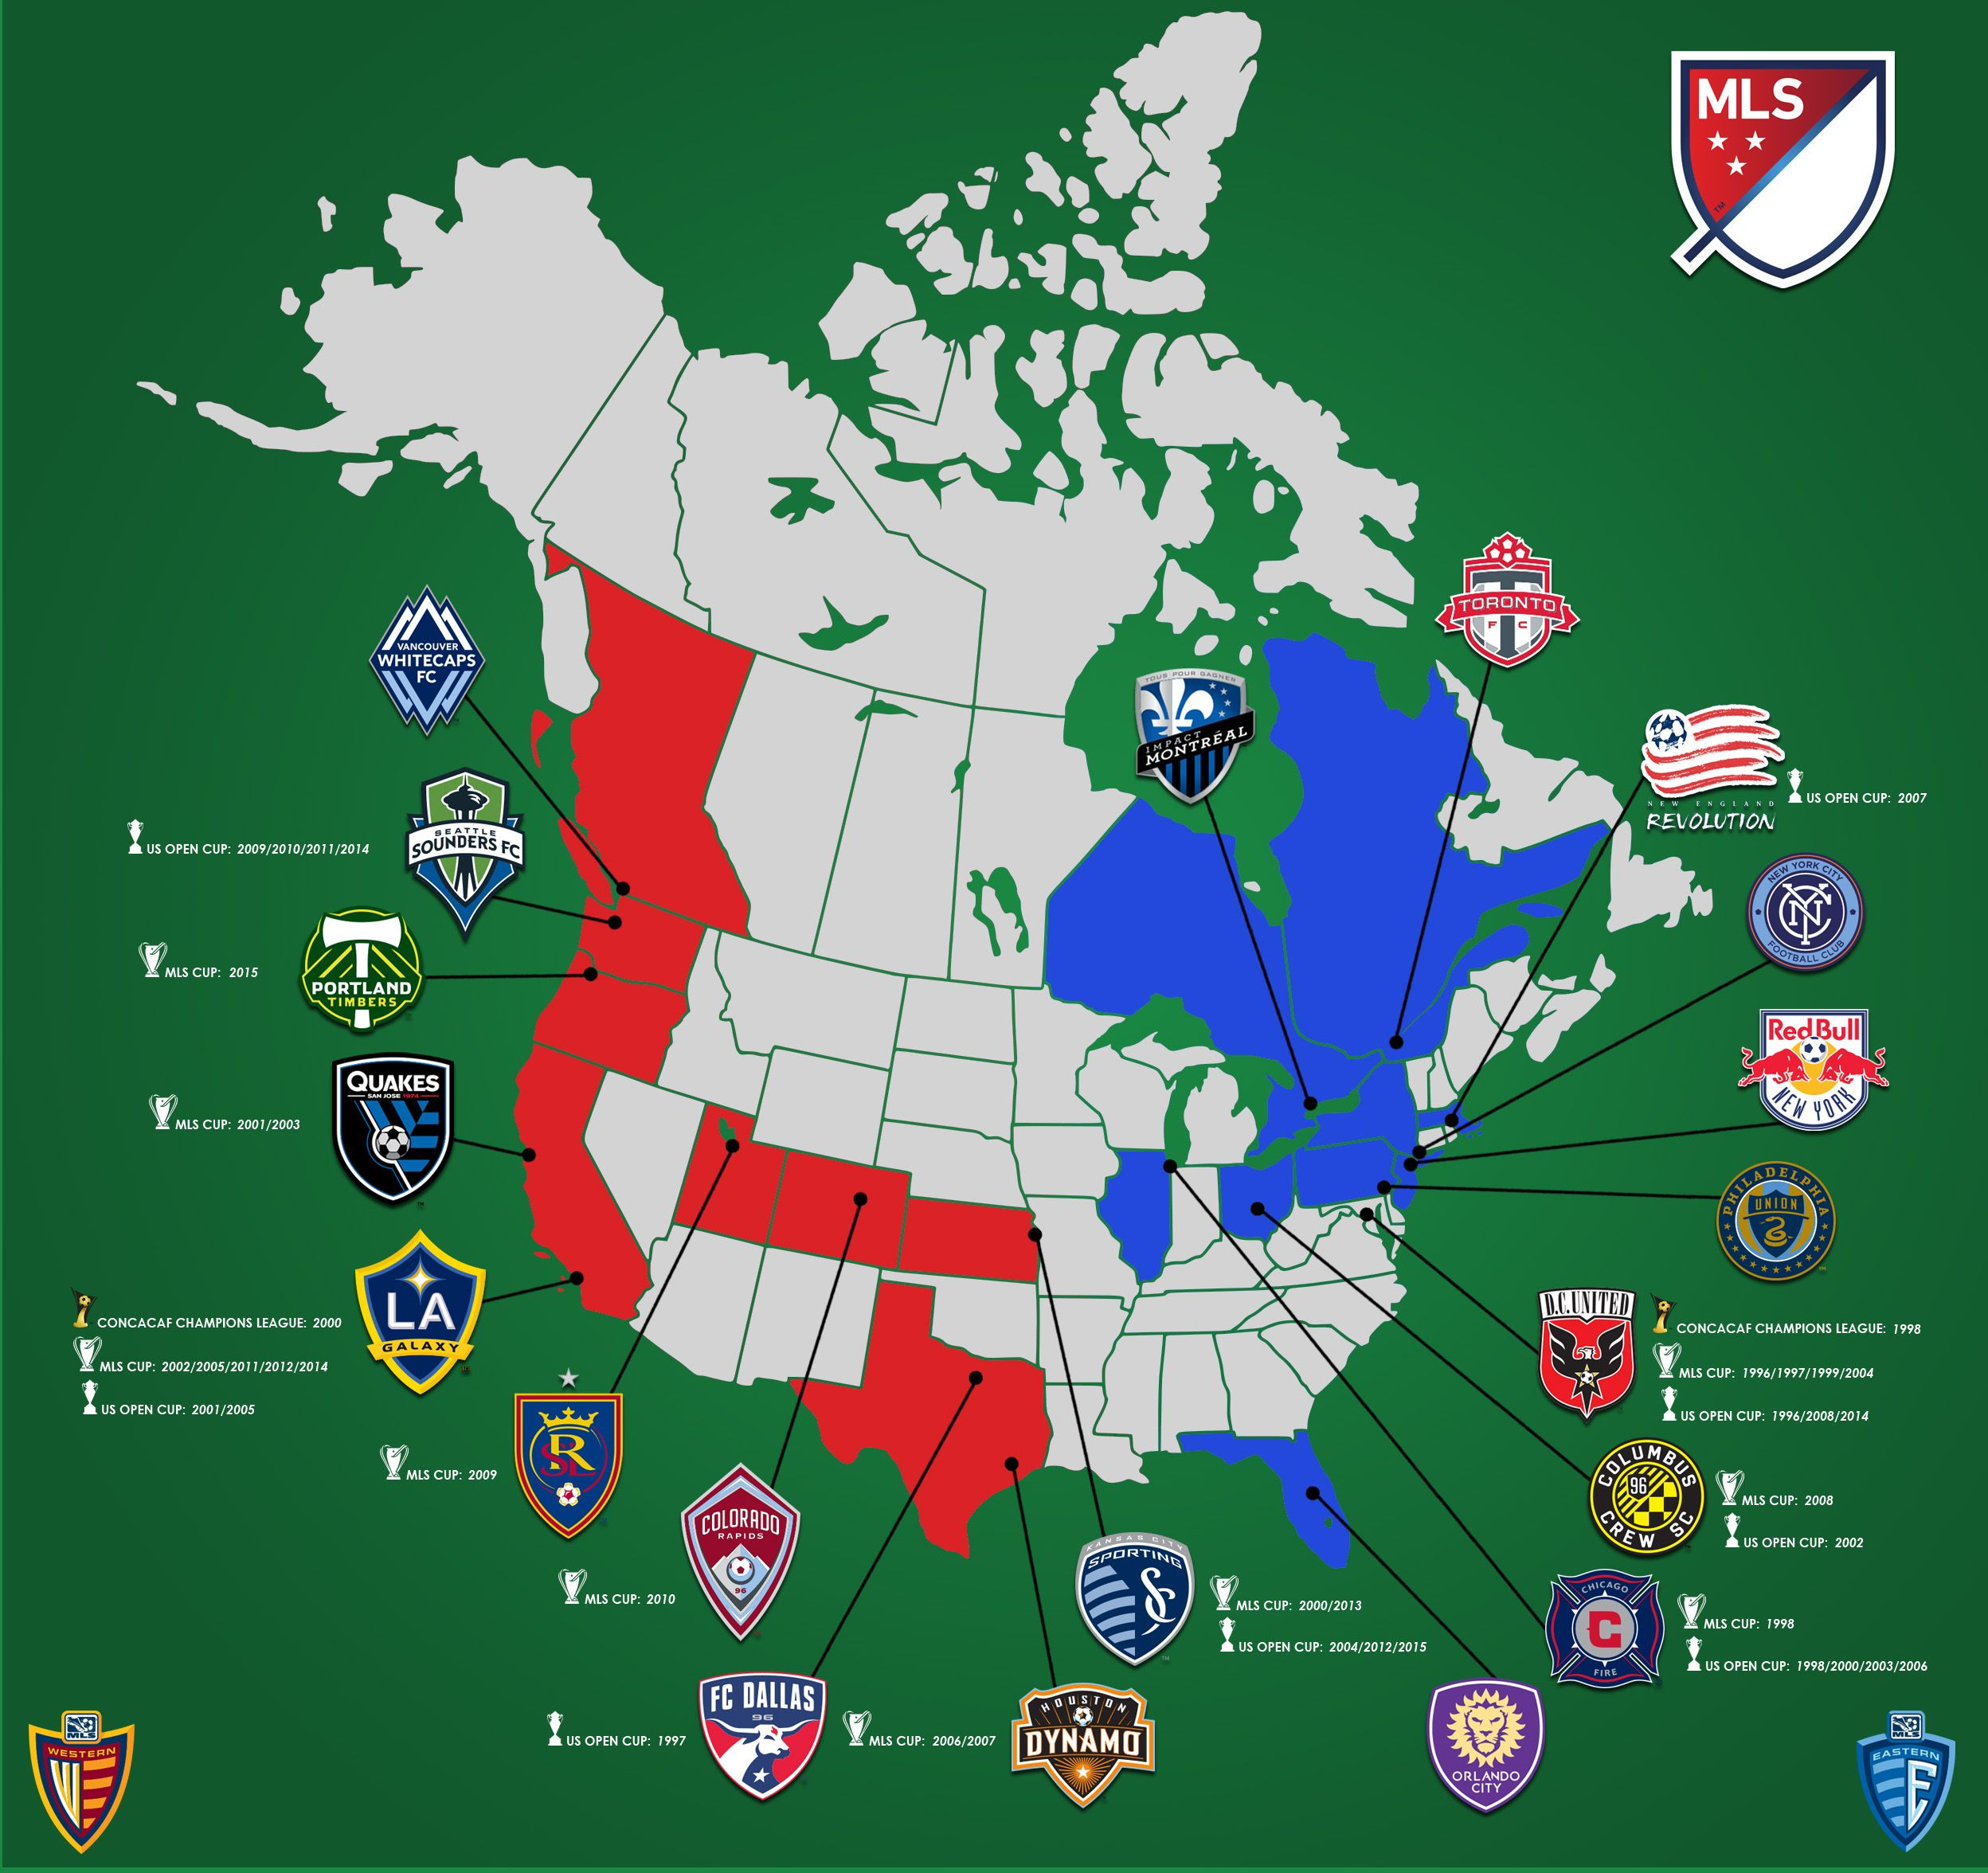 Mls Canada Map Made this MLS map. Enjoy   soccer http://i.imgur.com/wwbcJR7.